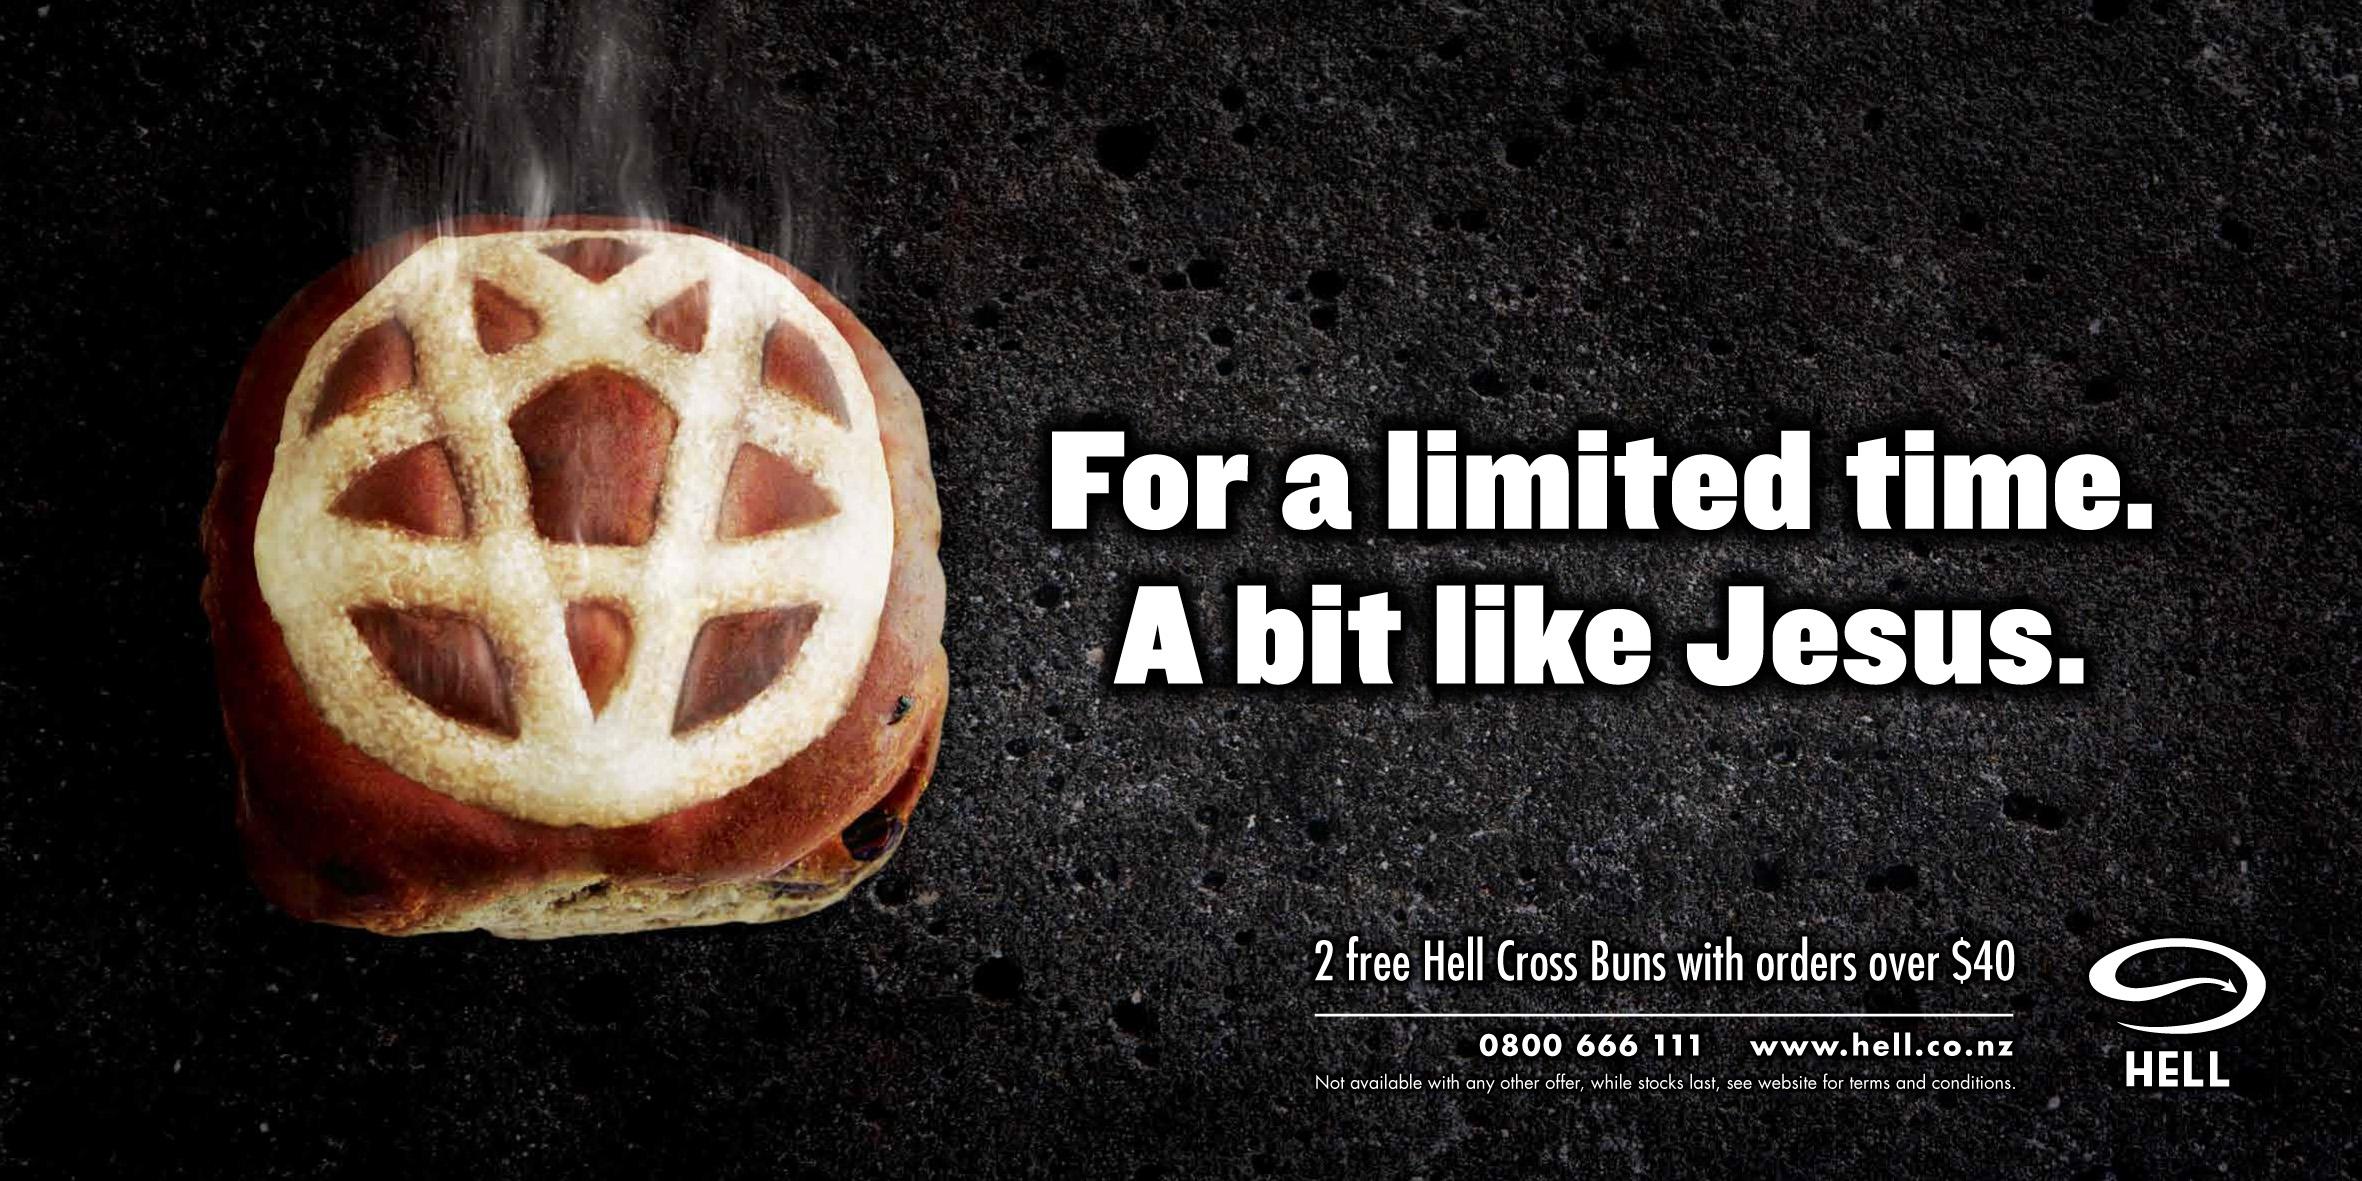 hells_cross_buns_billboard